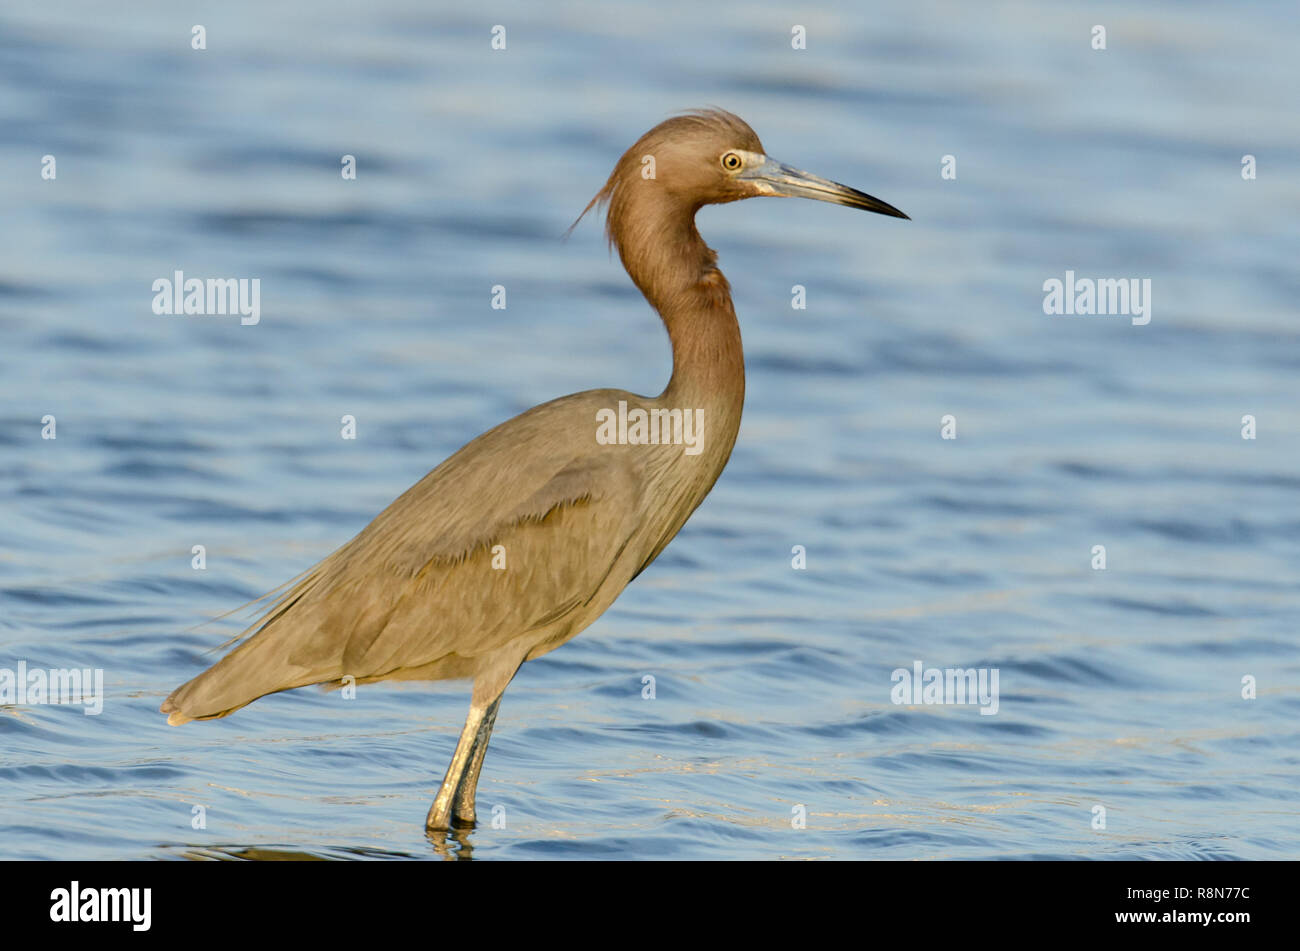 Reddish egret (Egretta rufescens) is a Near Threatened bird found in Florida's coastal lands. - Stock Image